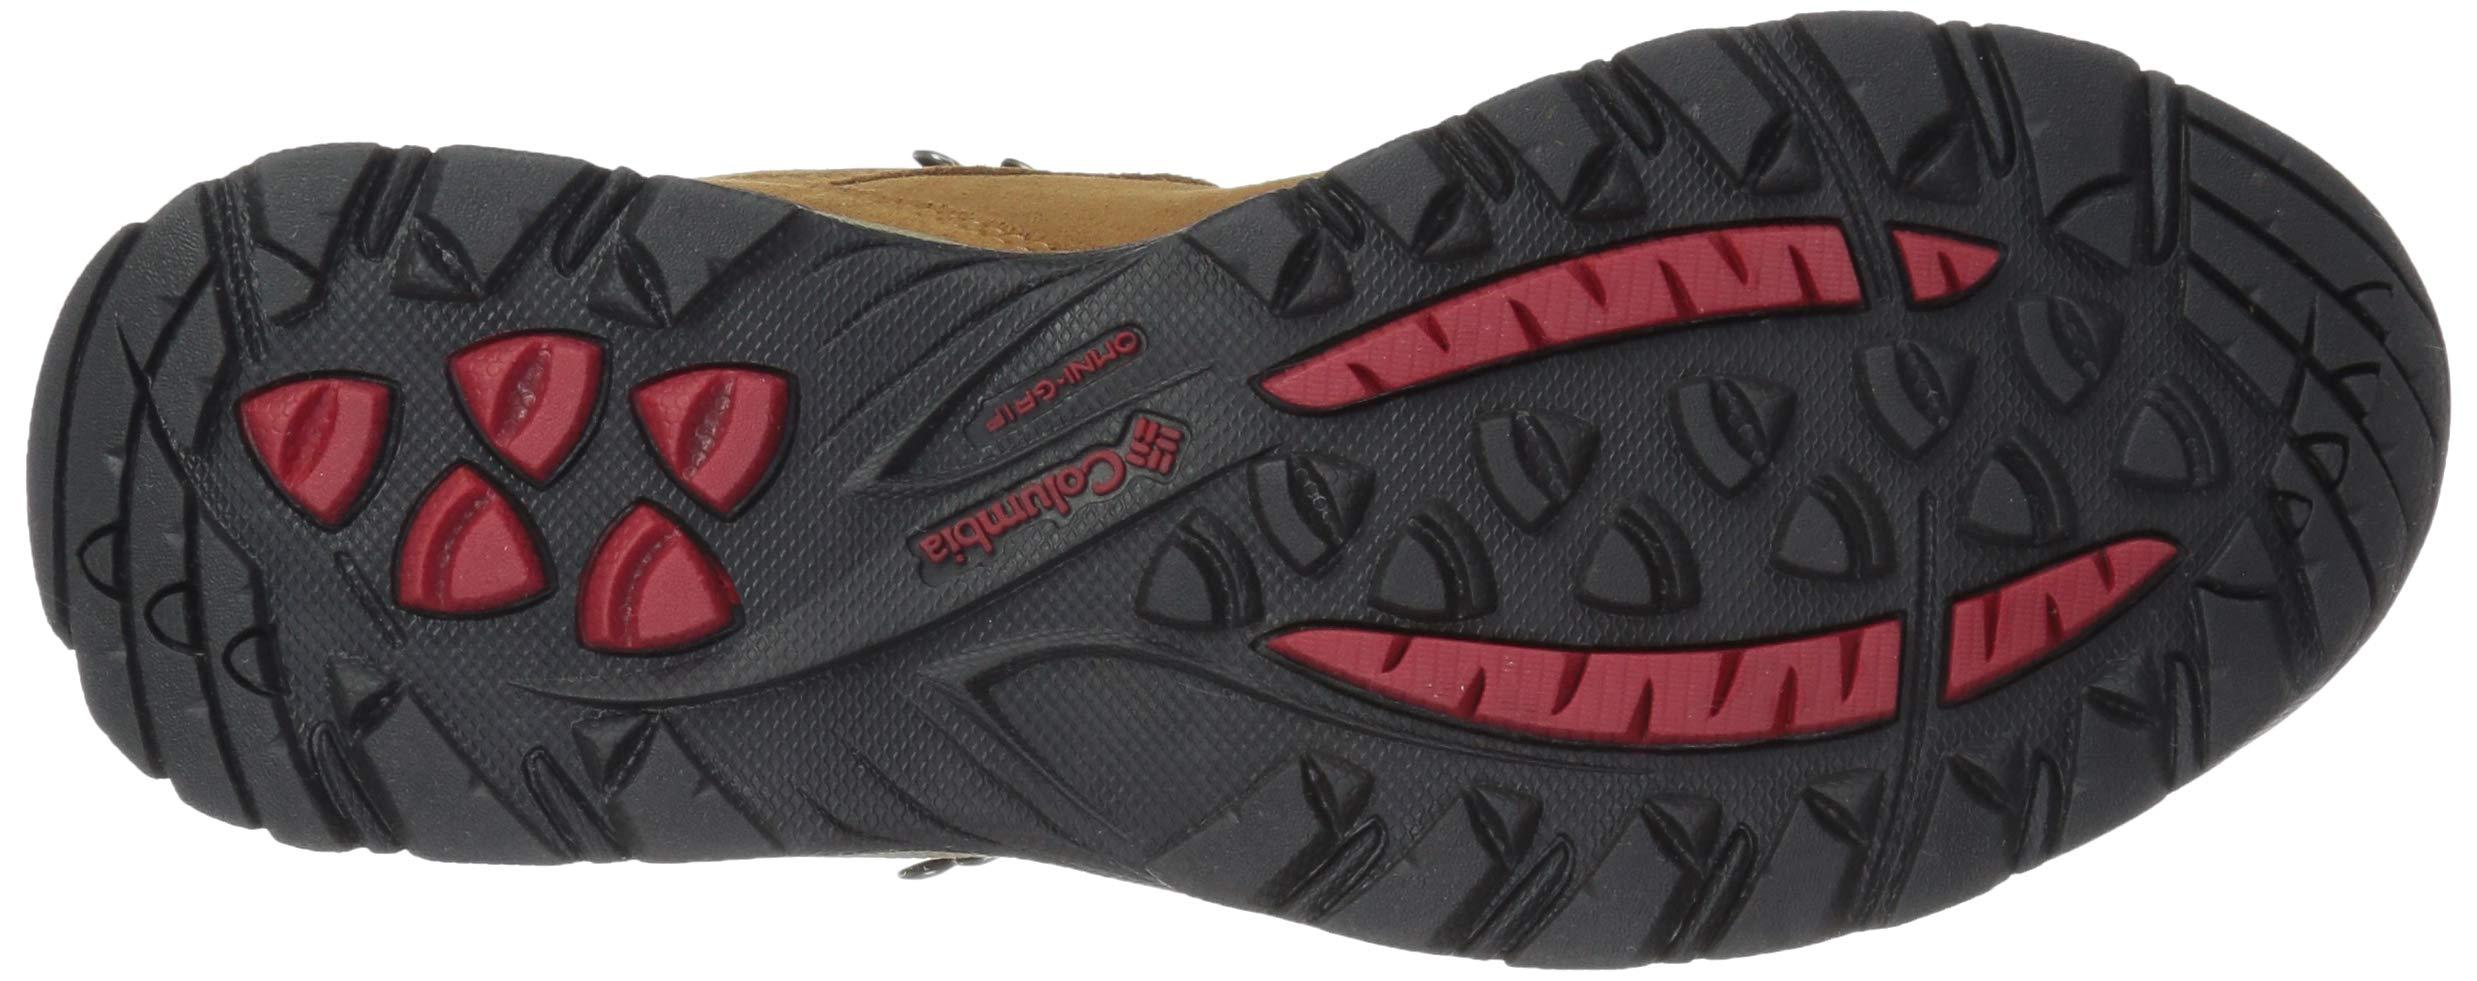 8ccb994205c Columbia Women s Newton Ridge Plus Waterproof Amped Hiking Boot